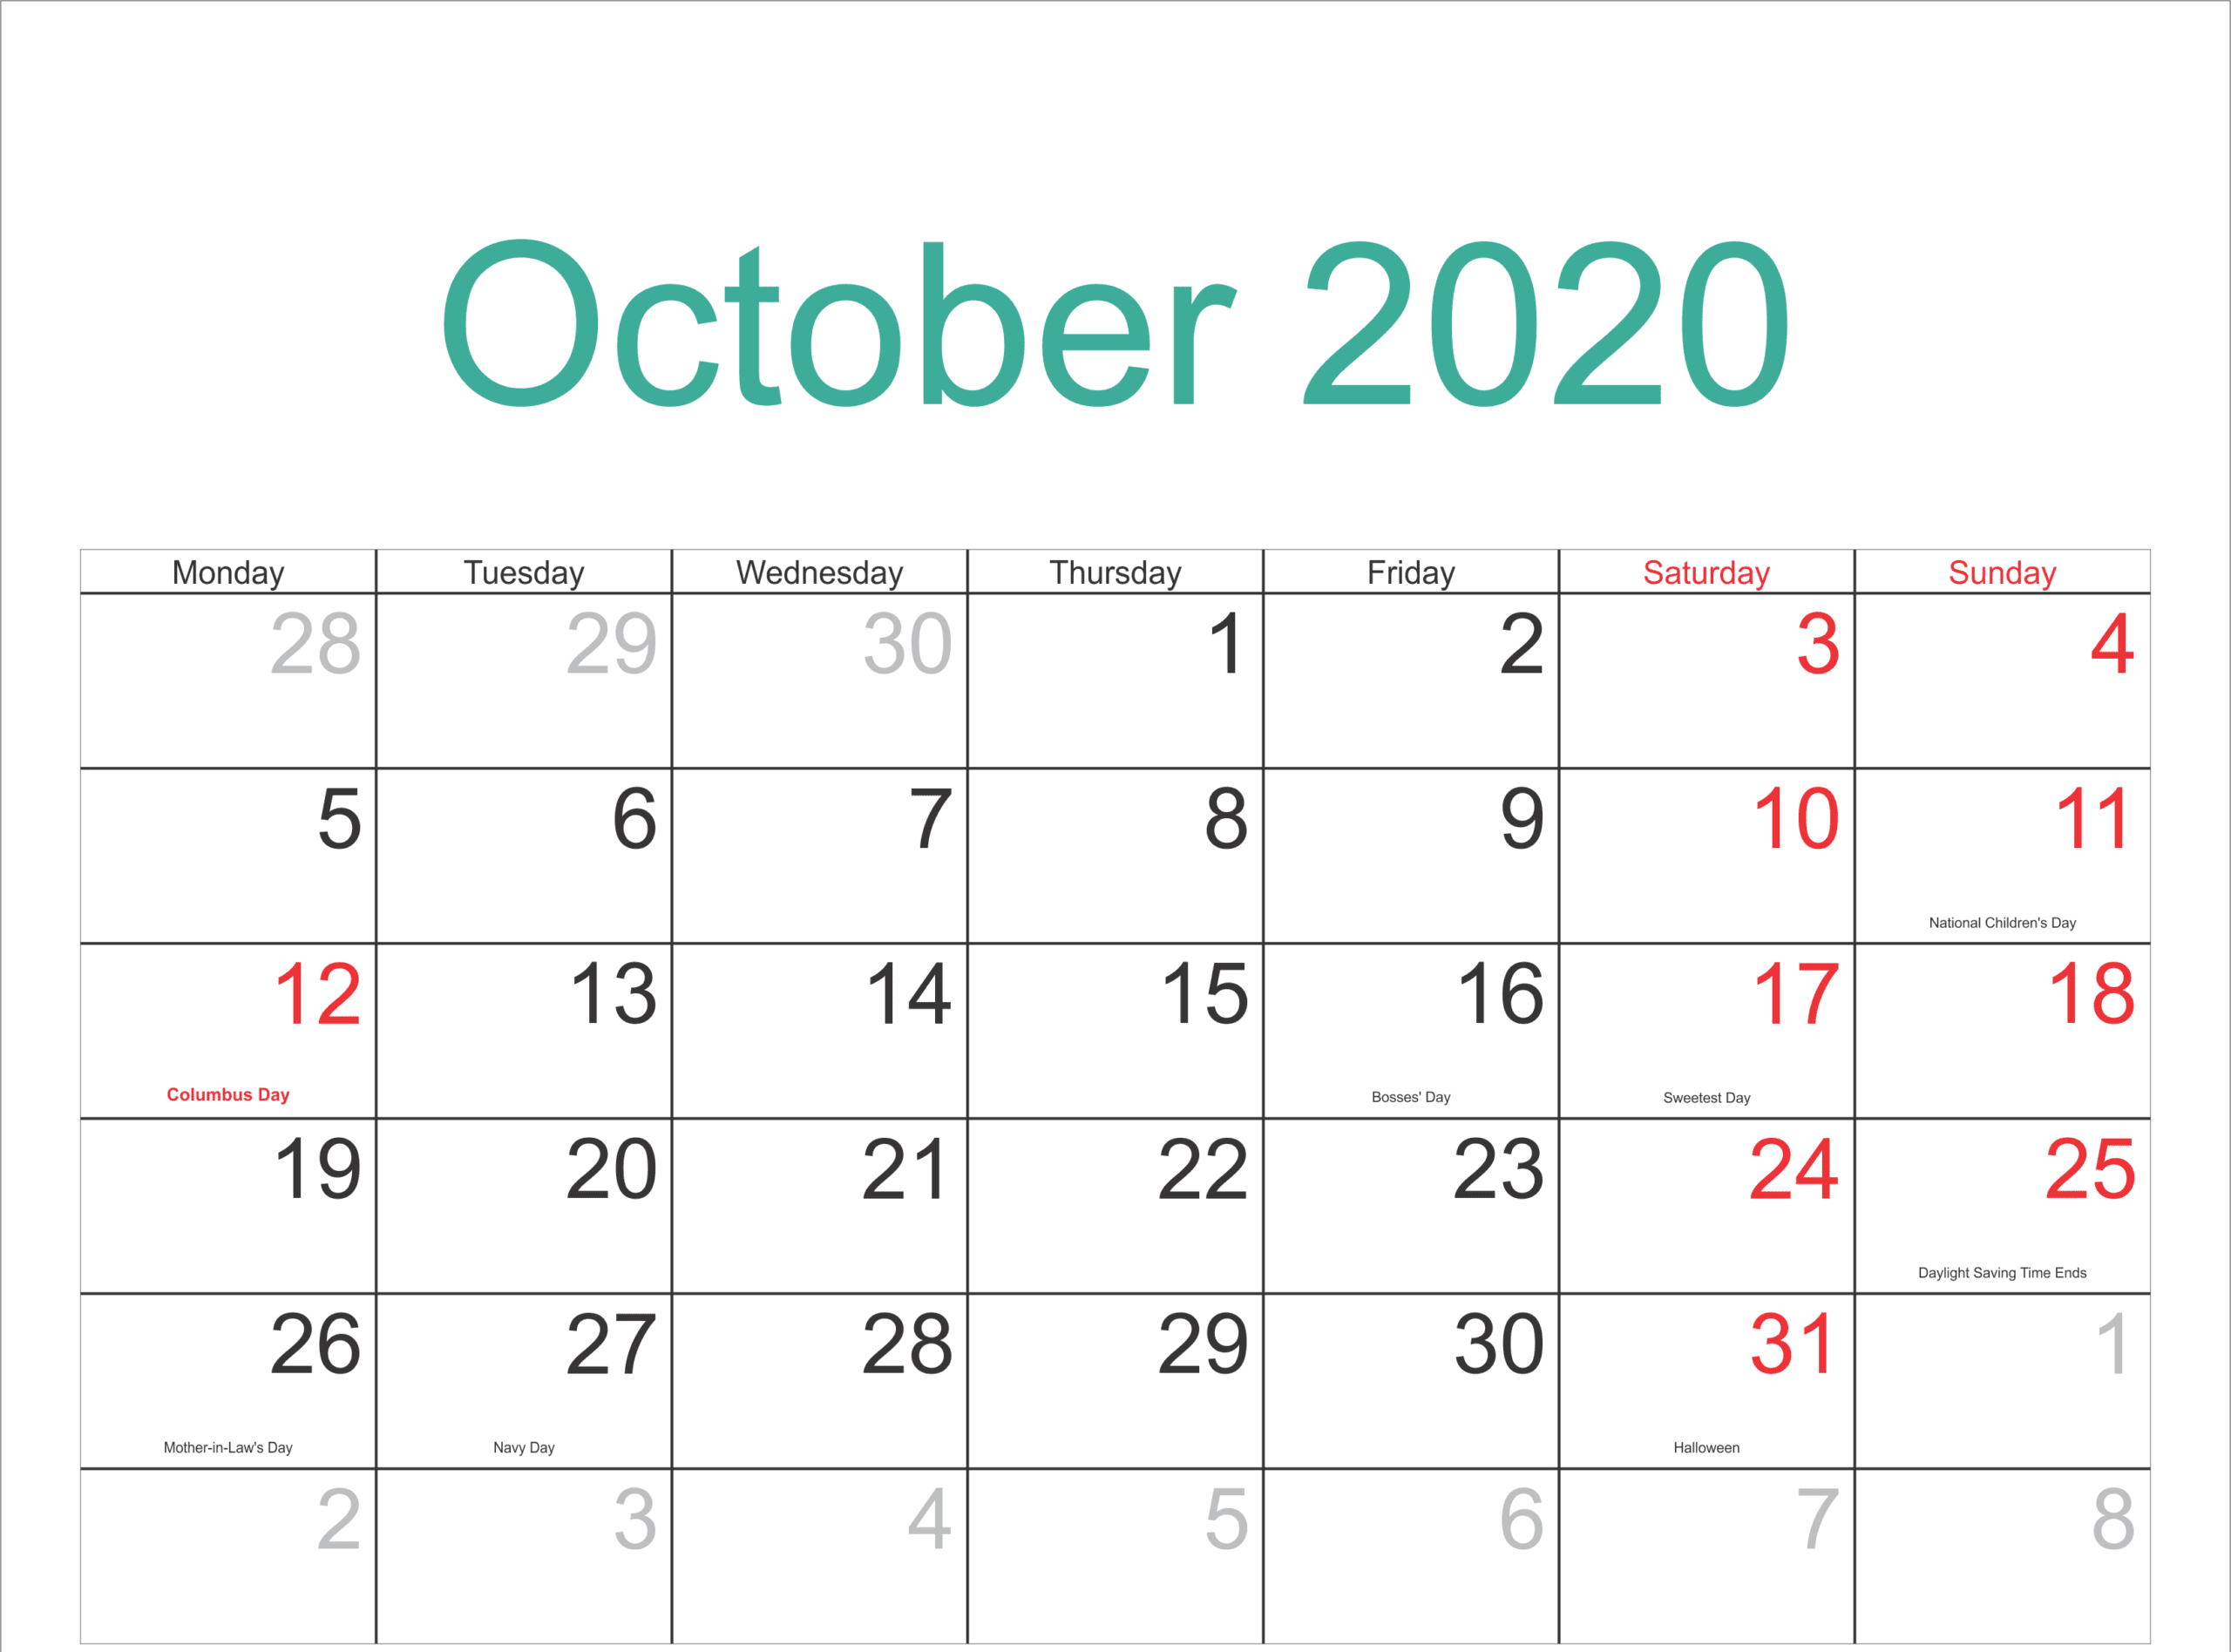 October Calendar 2020 Blank Template